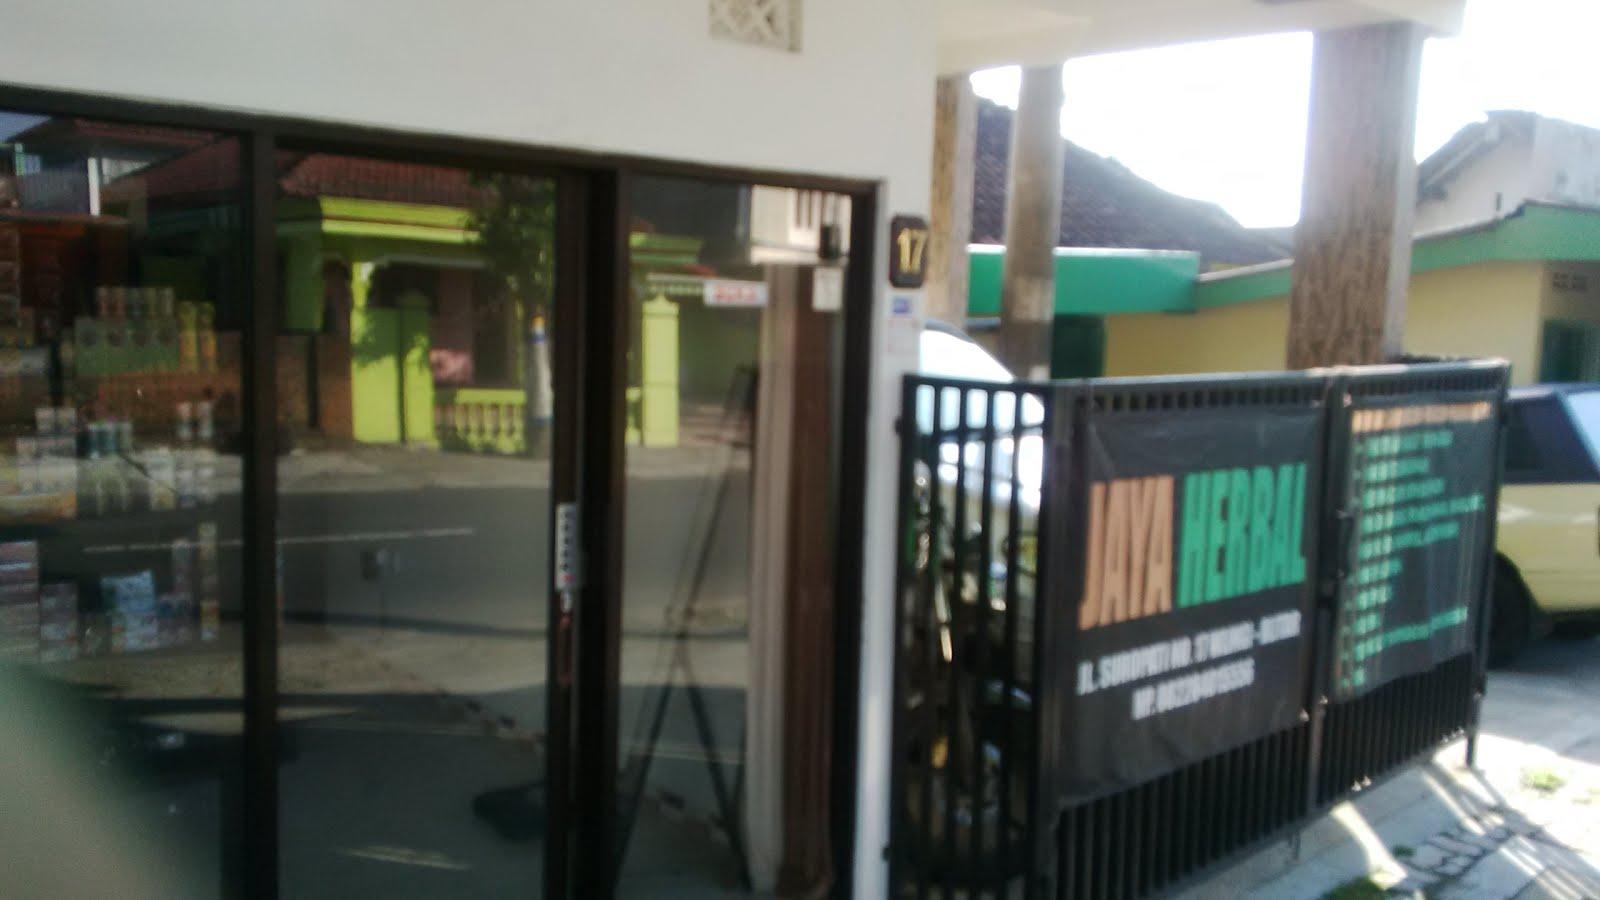 Jual Gamat Gold G Wlingi Blitar Madu Ibu Hamil Al Mabruroh Maburoh Jl Suropati 17 Tanggung